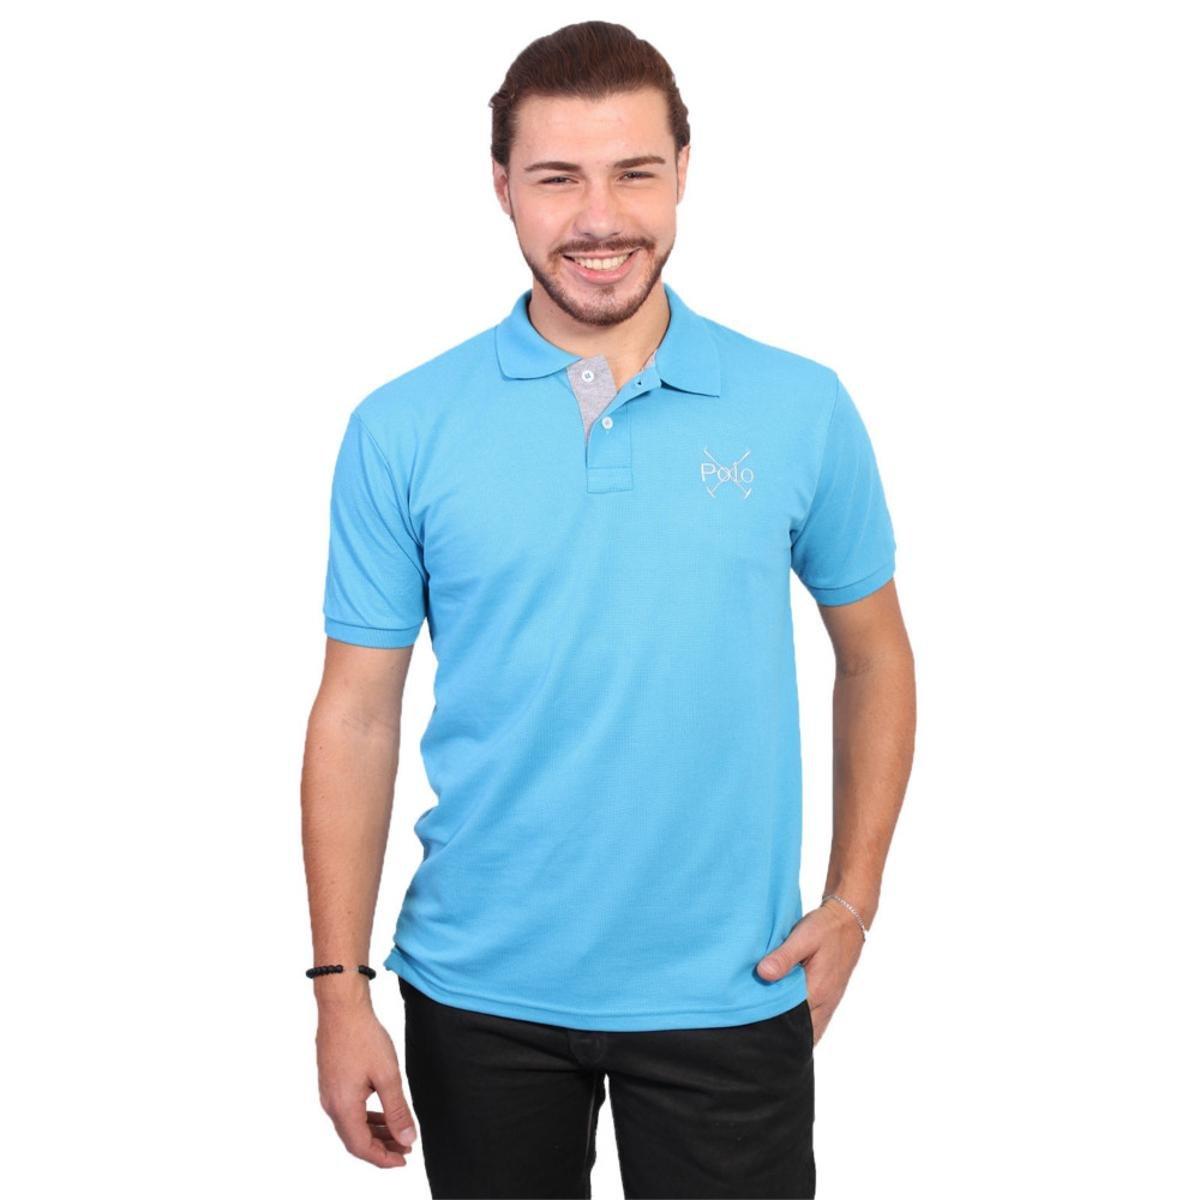 Camisa Polo England Polo Club Casual - Compre Agora  f78ae6a1e514d